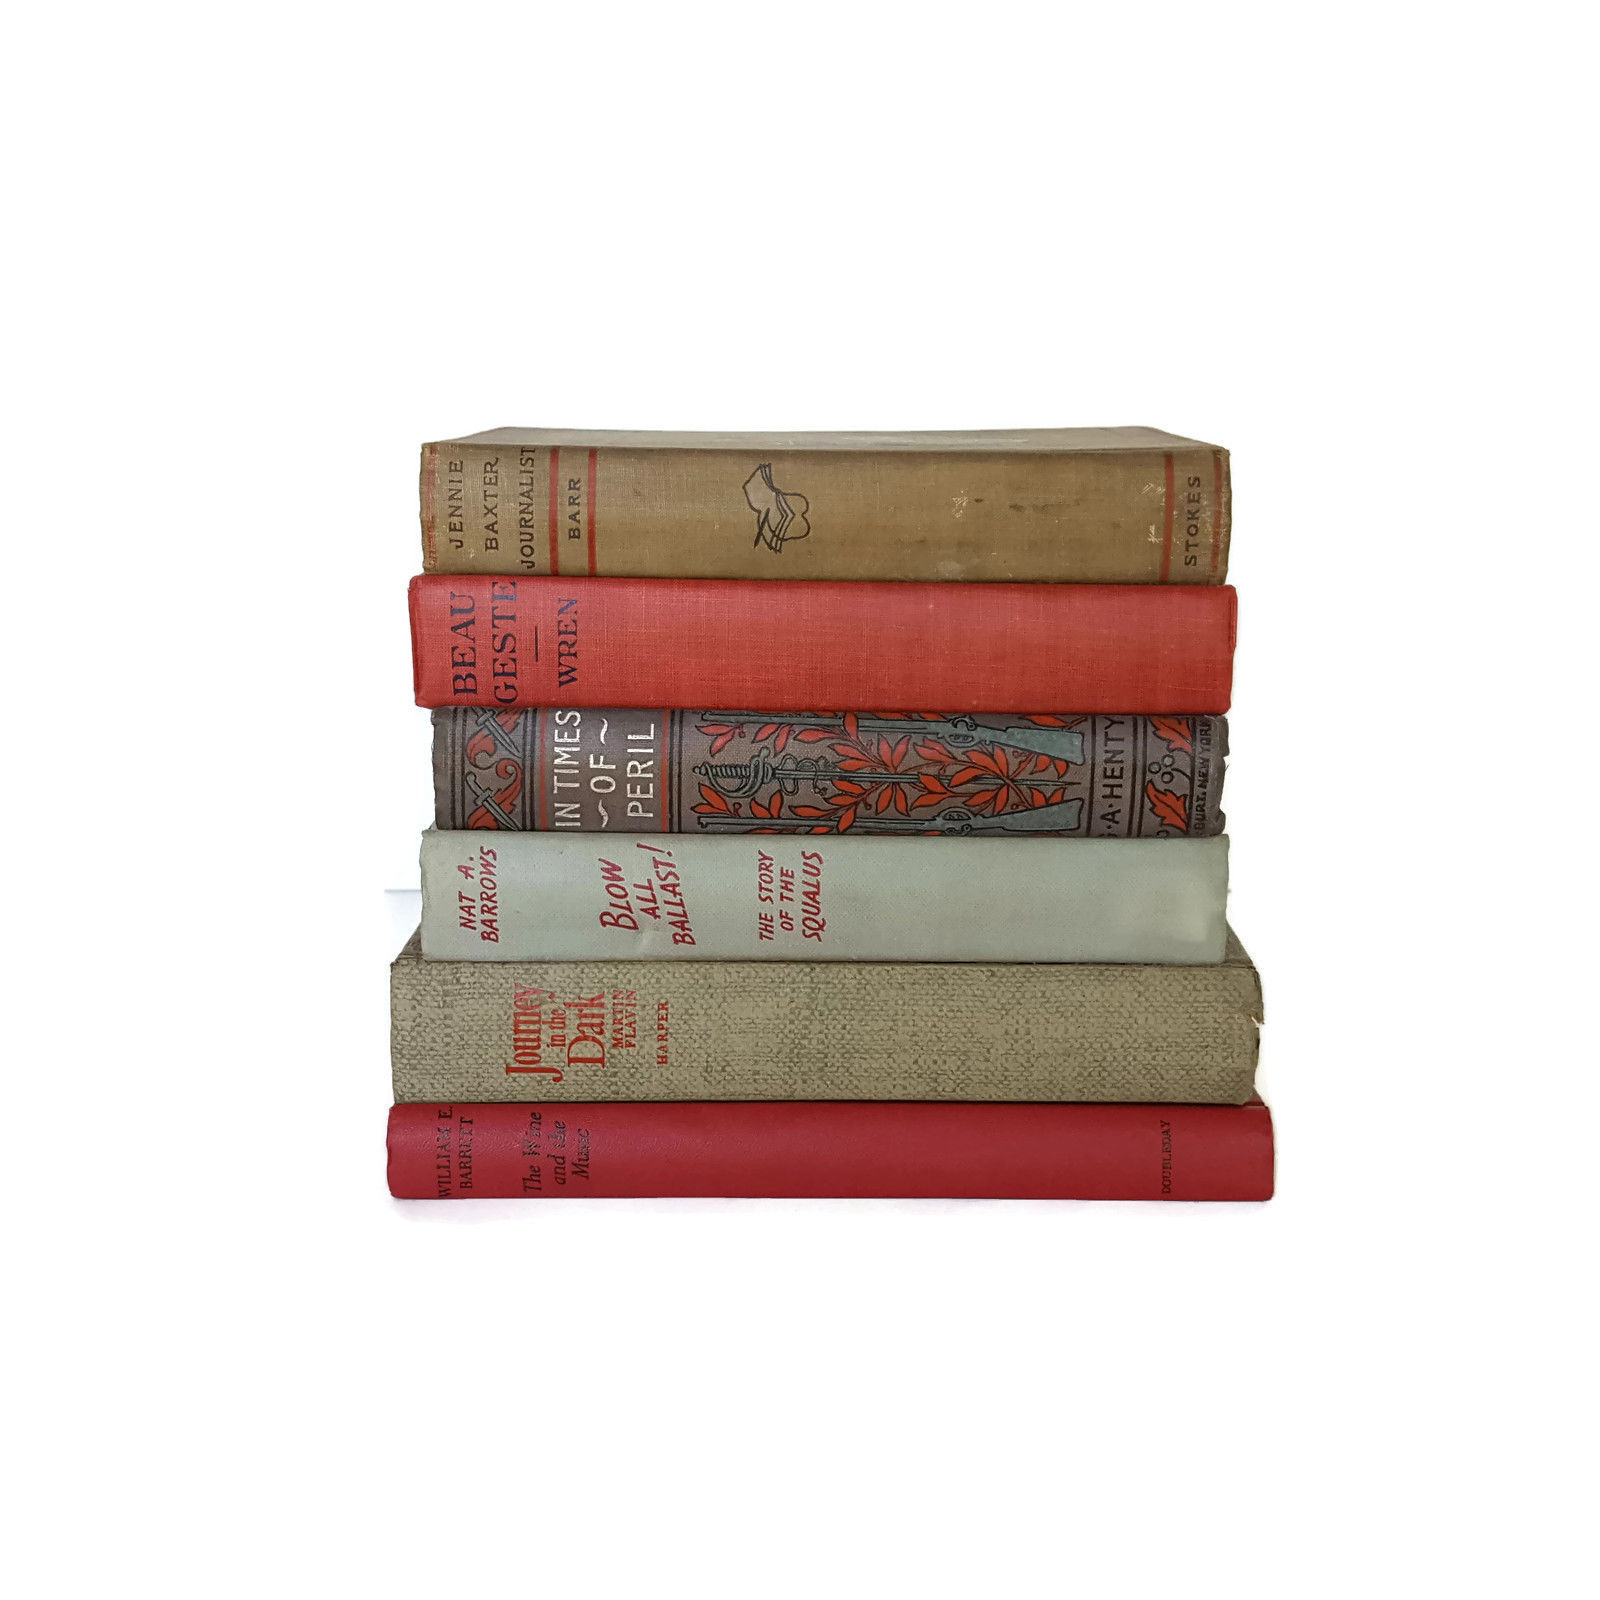 Vintage Book Stack Lot 6 Blue Red Grey Antique Farmhouse Wedding Decorative